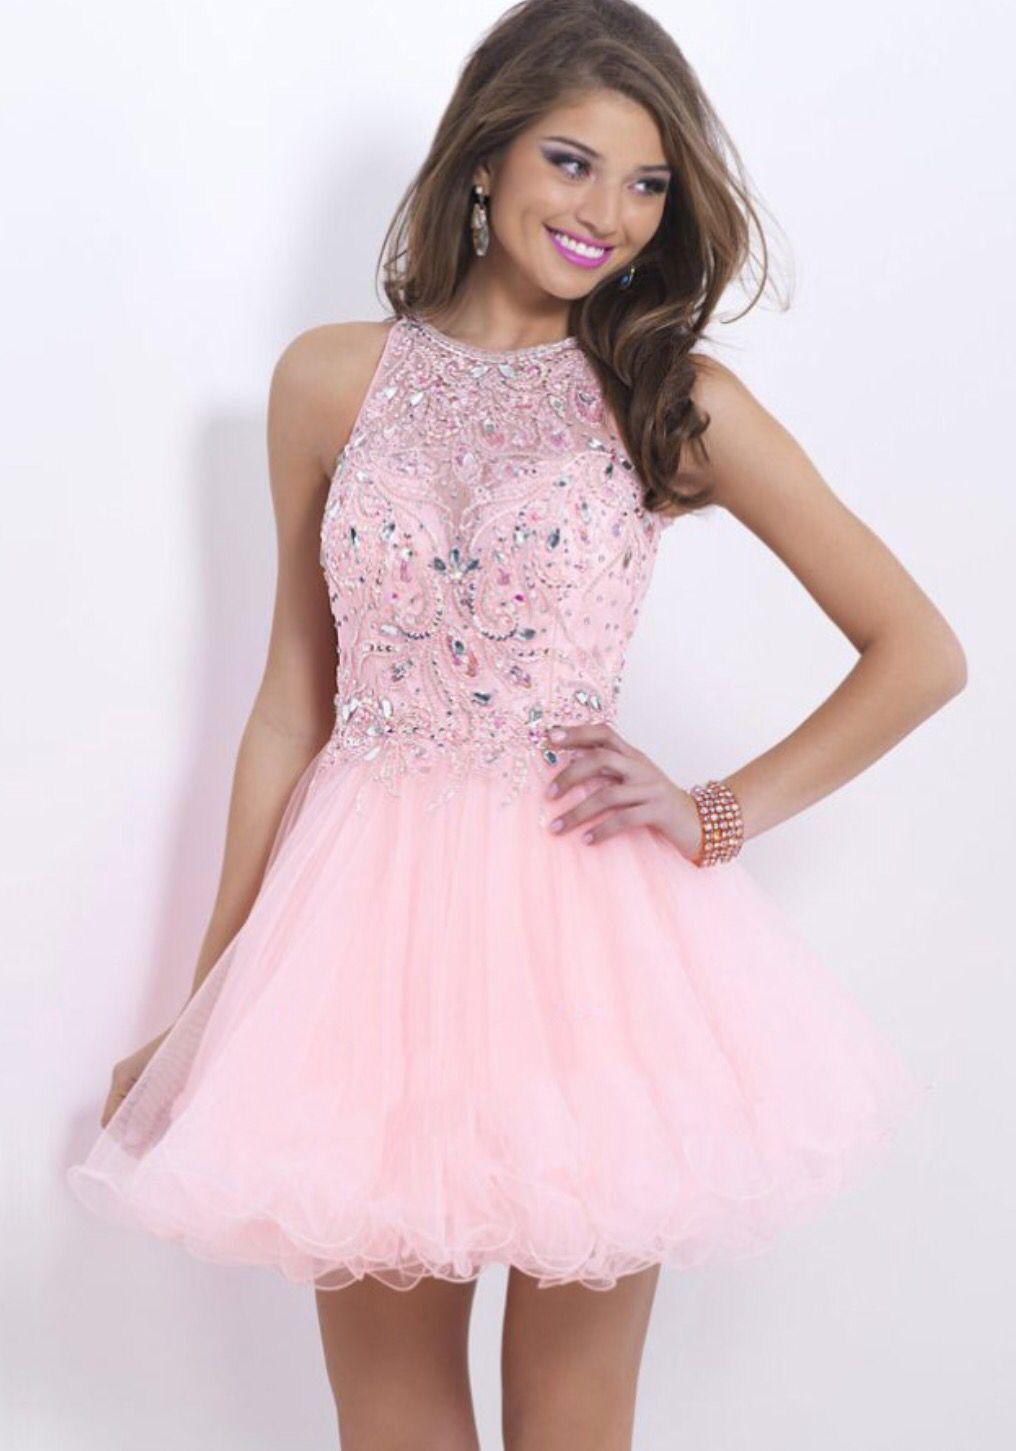 Short prom dresses.ladies get set go.xD | sweet 16 | Pinterest ...